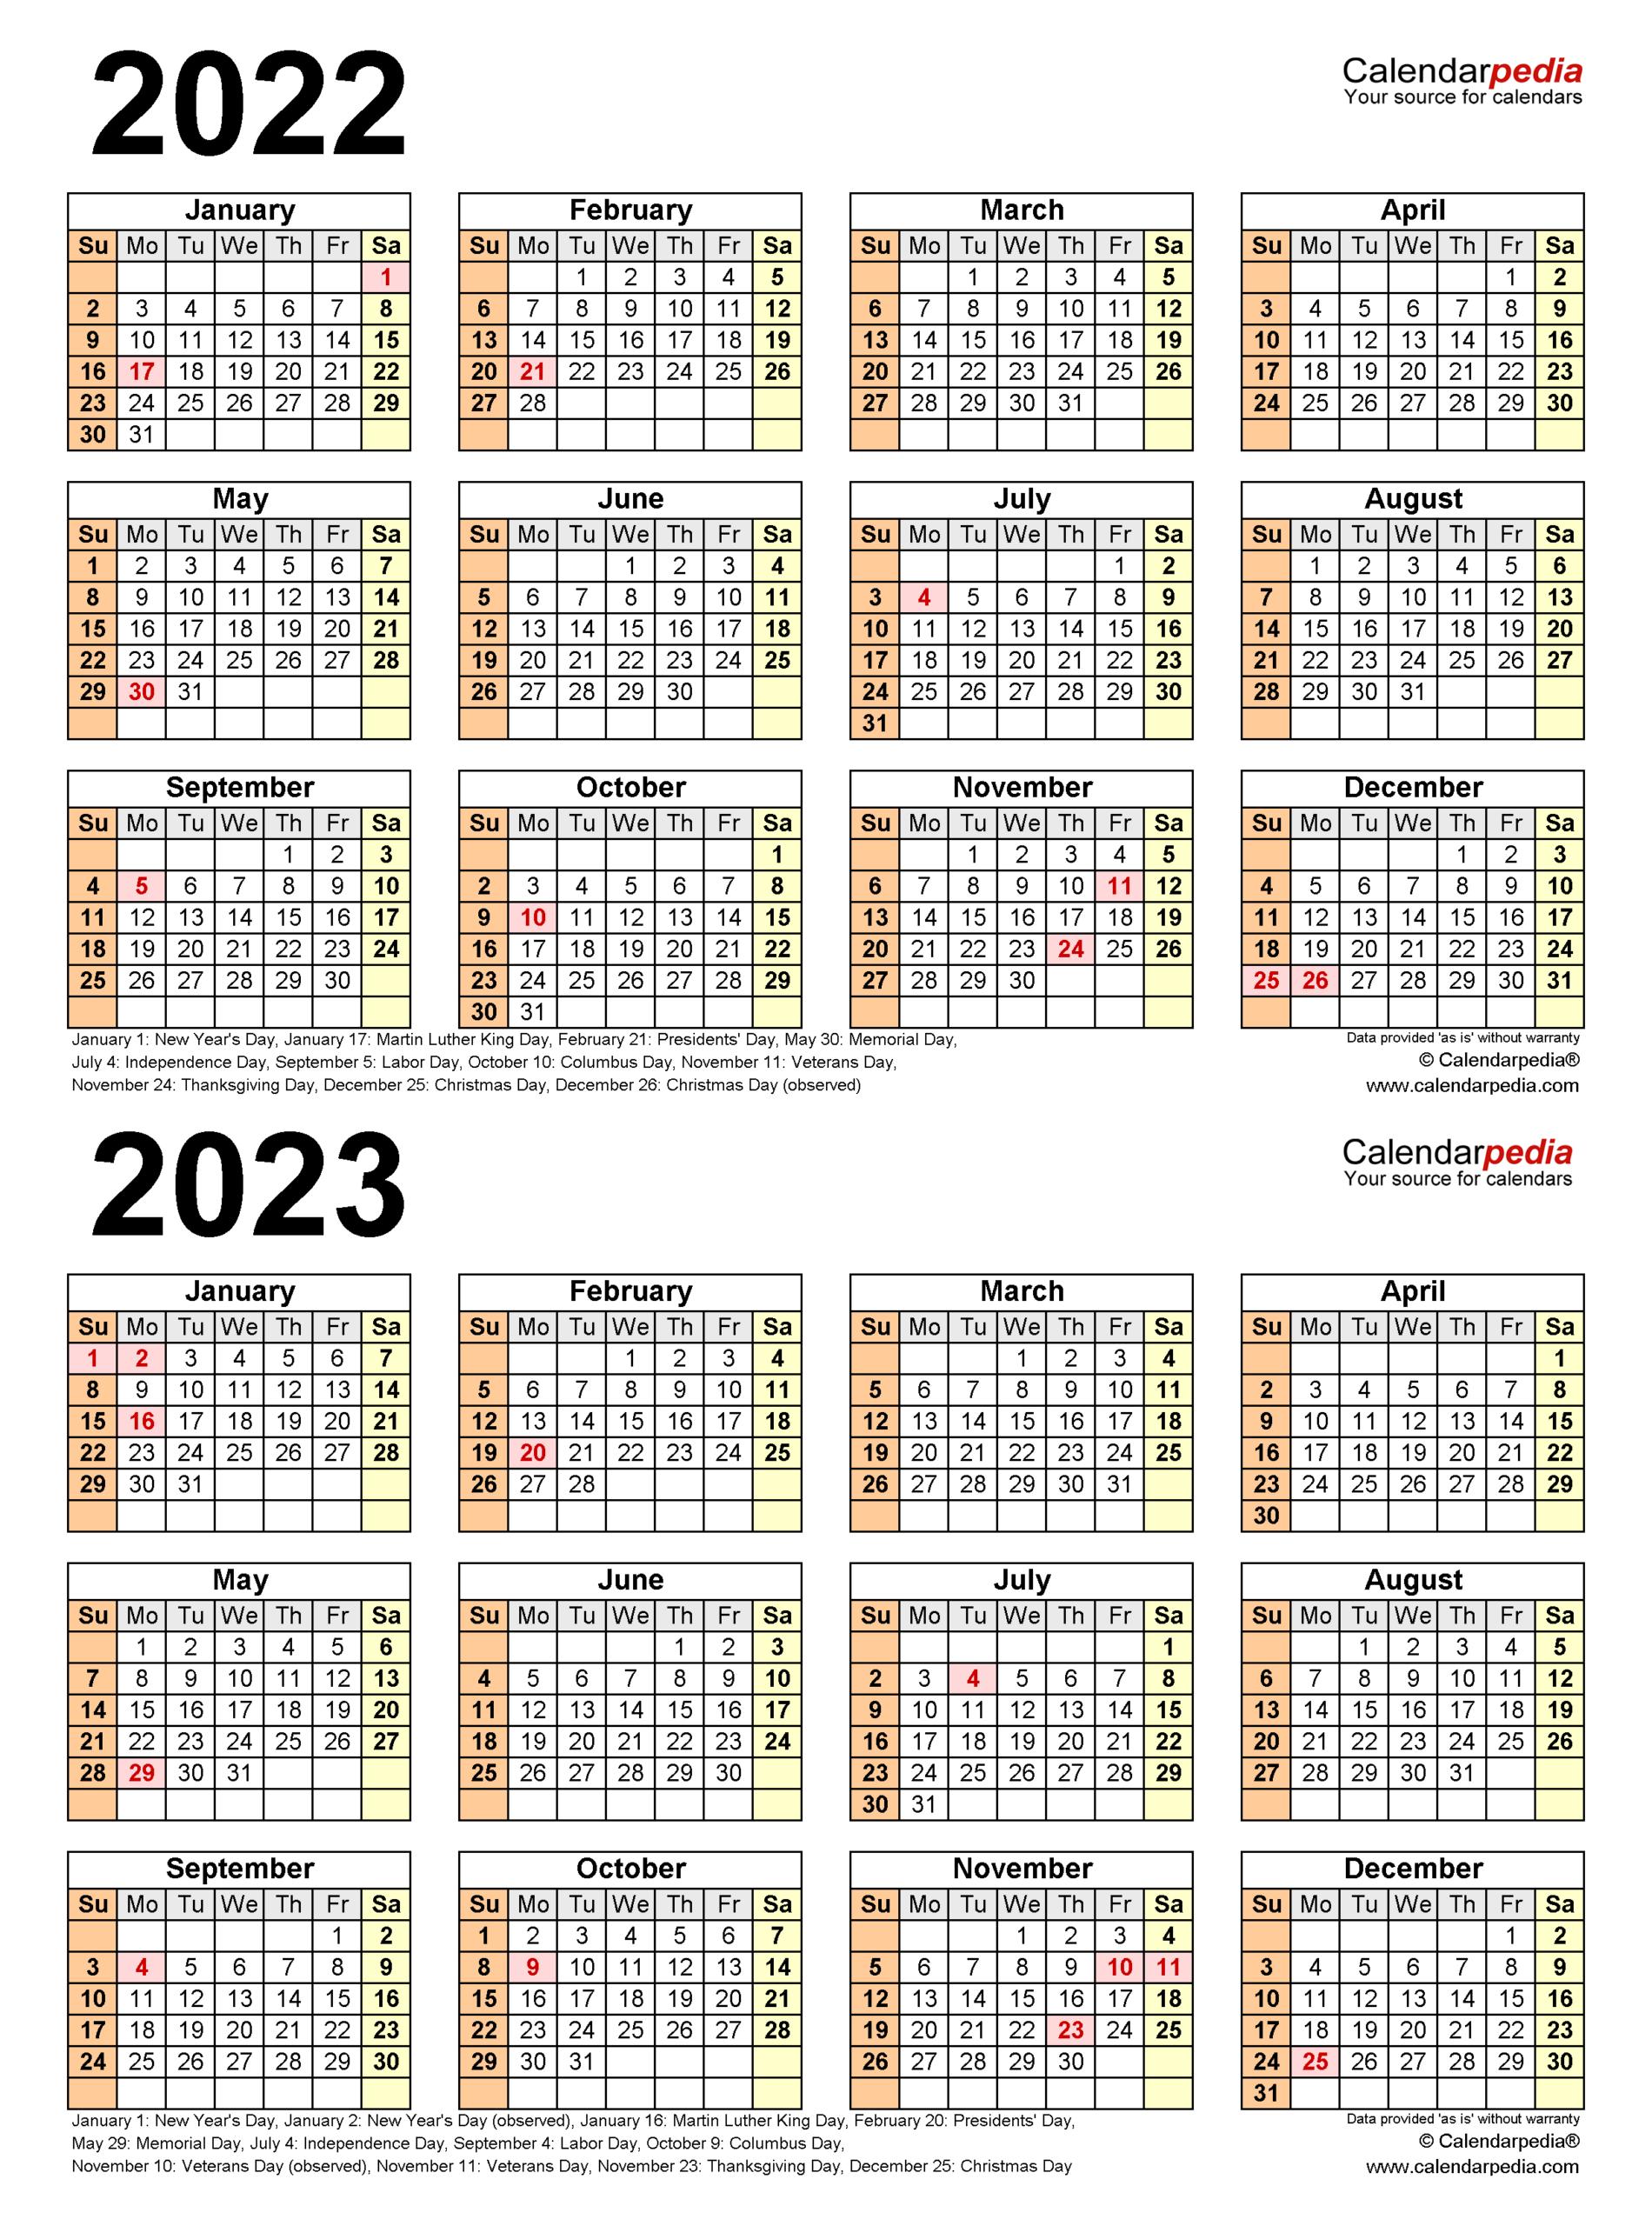 2022-2023 Two Year Calendar - Free Printable Word Templates within 2022 2023 School Calendar North Penn